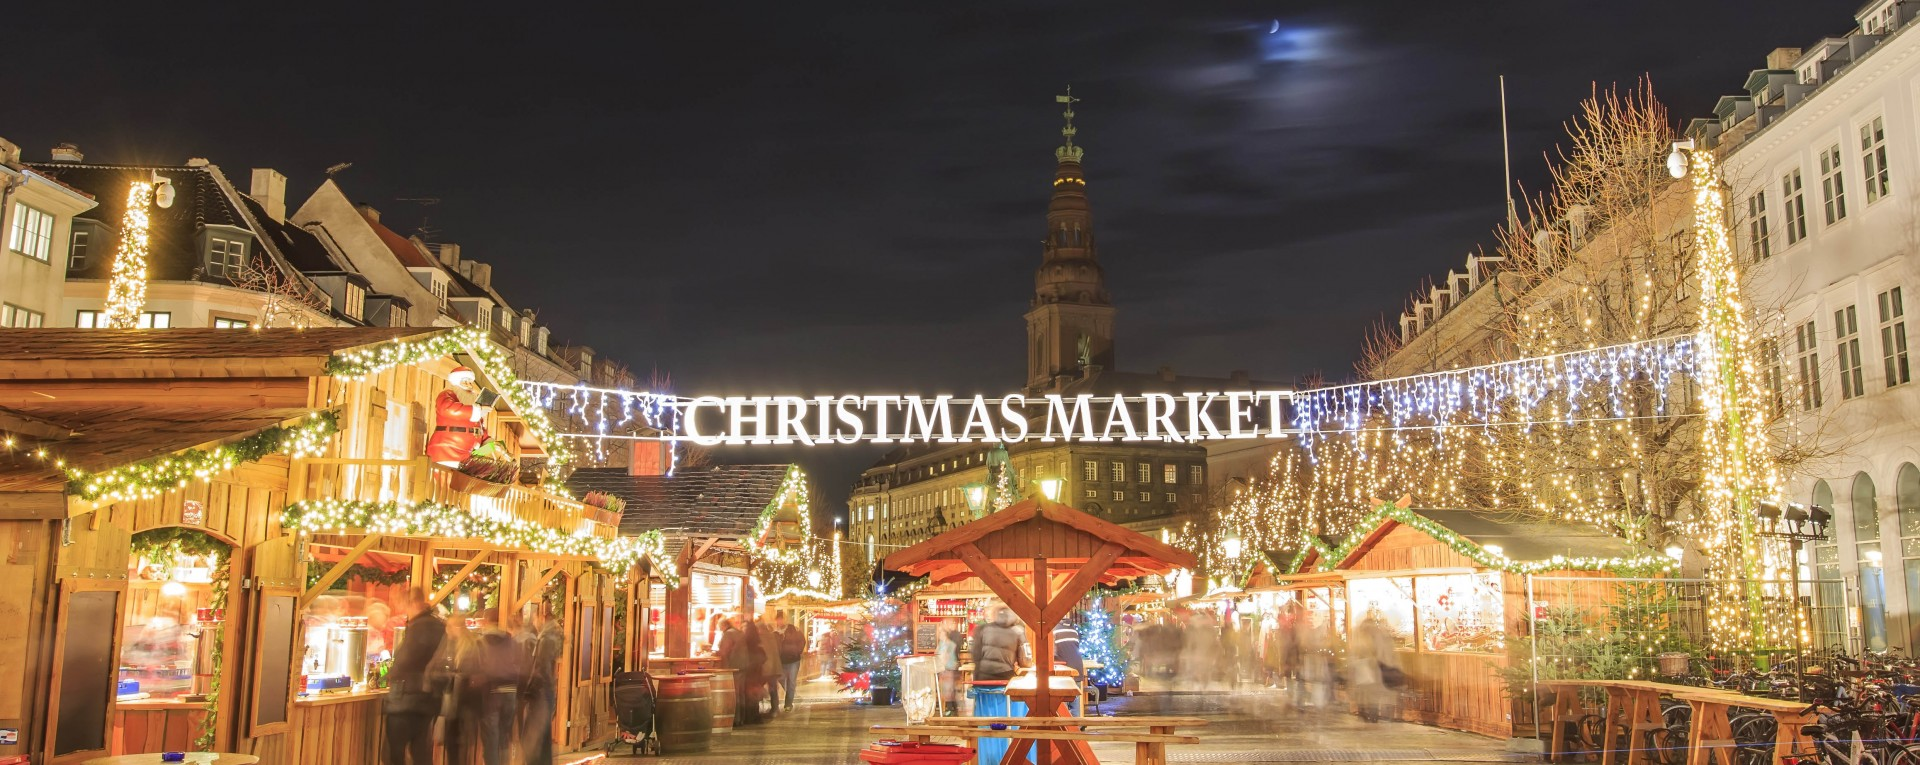 Christmas markets in 2017 in St. Petersburg 88